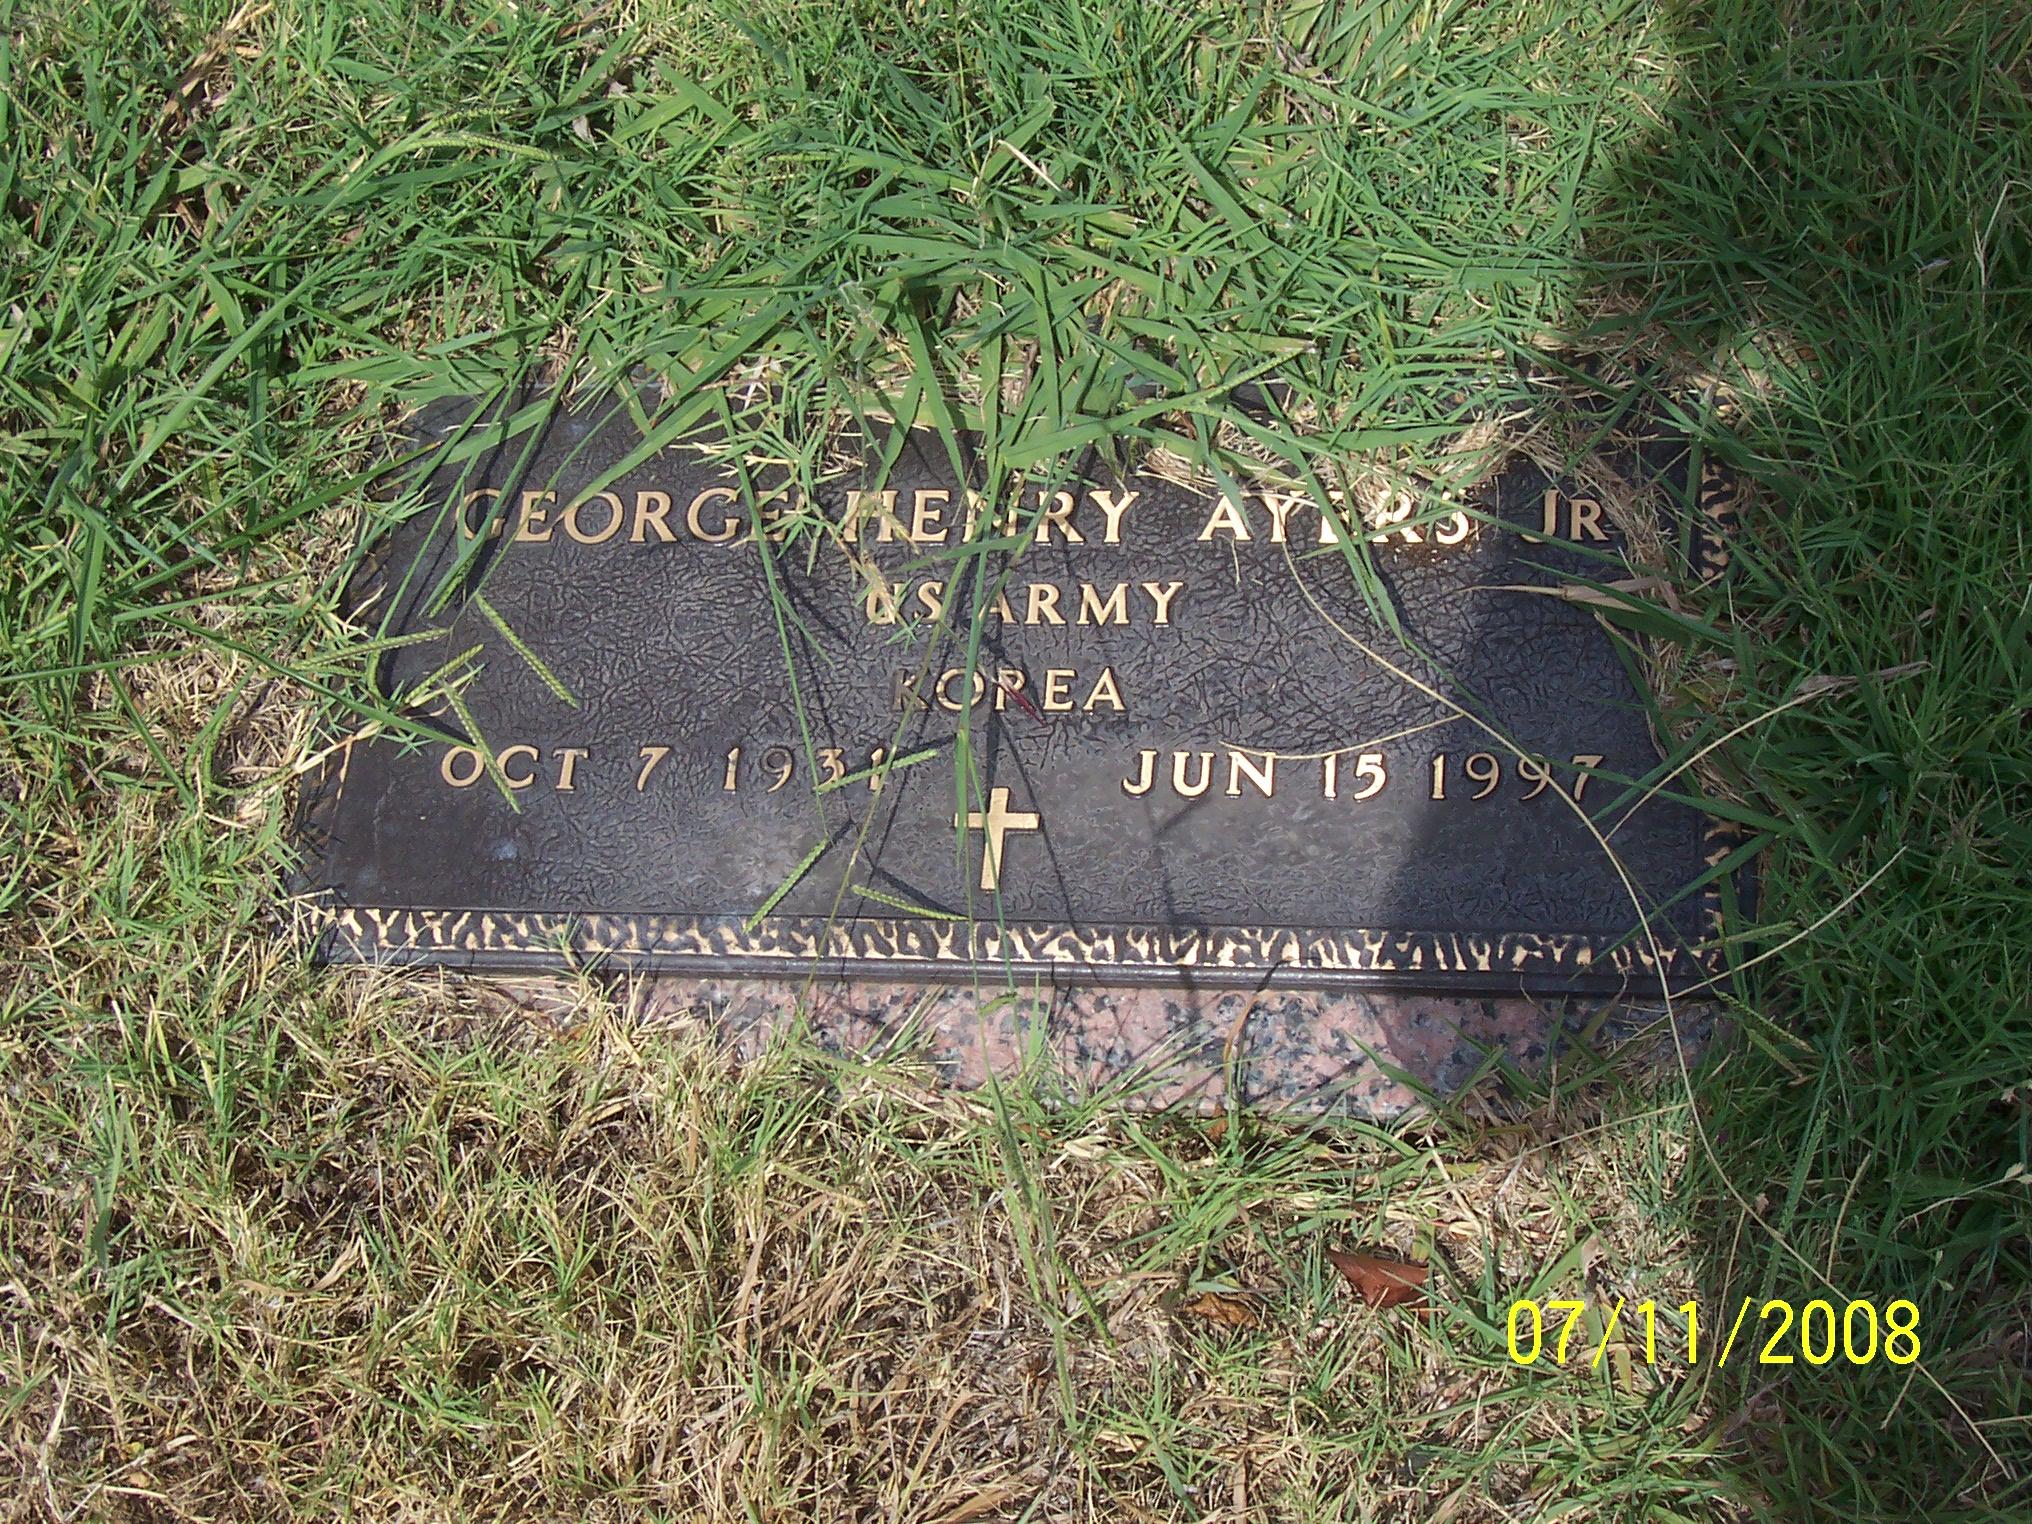 George Henry Ayers, Jr